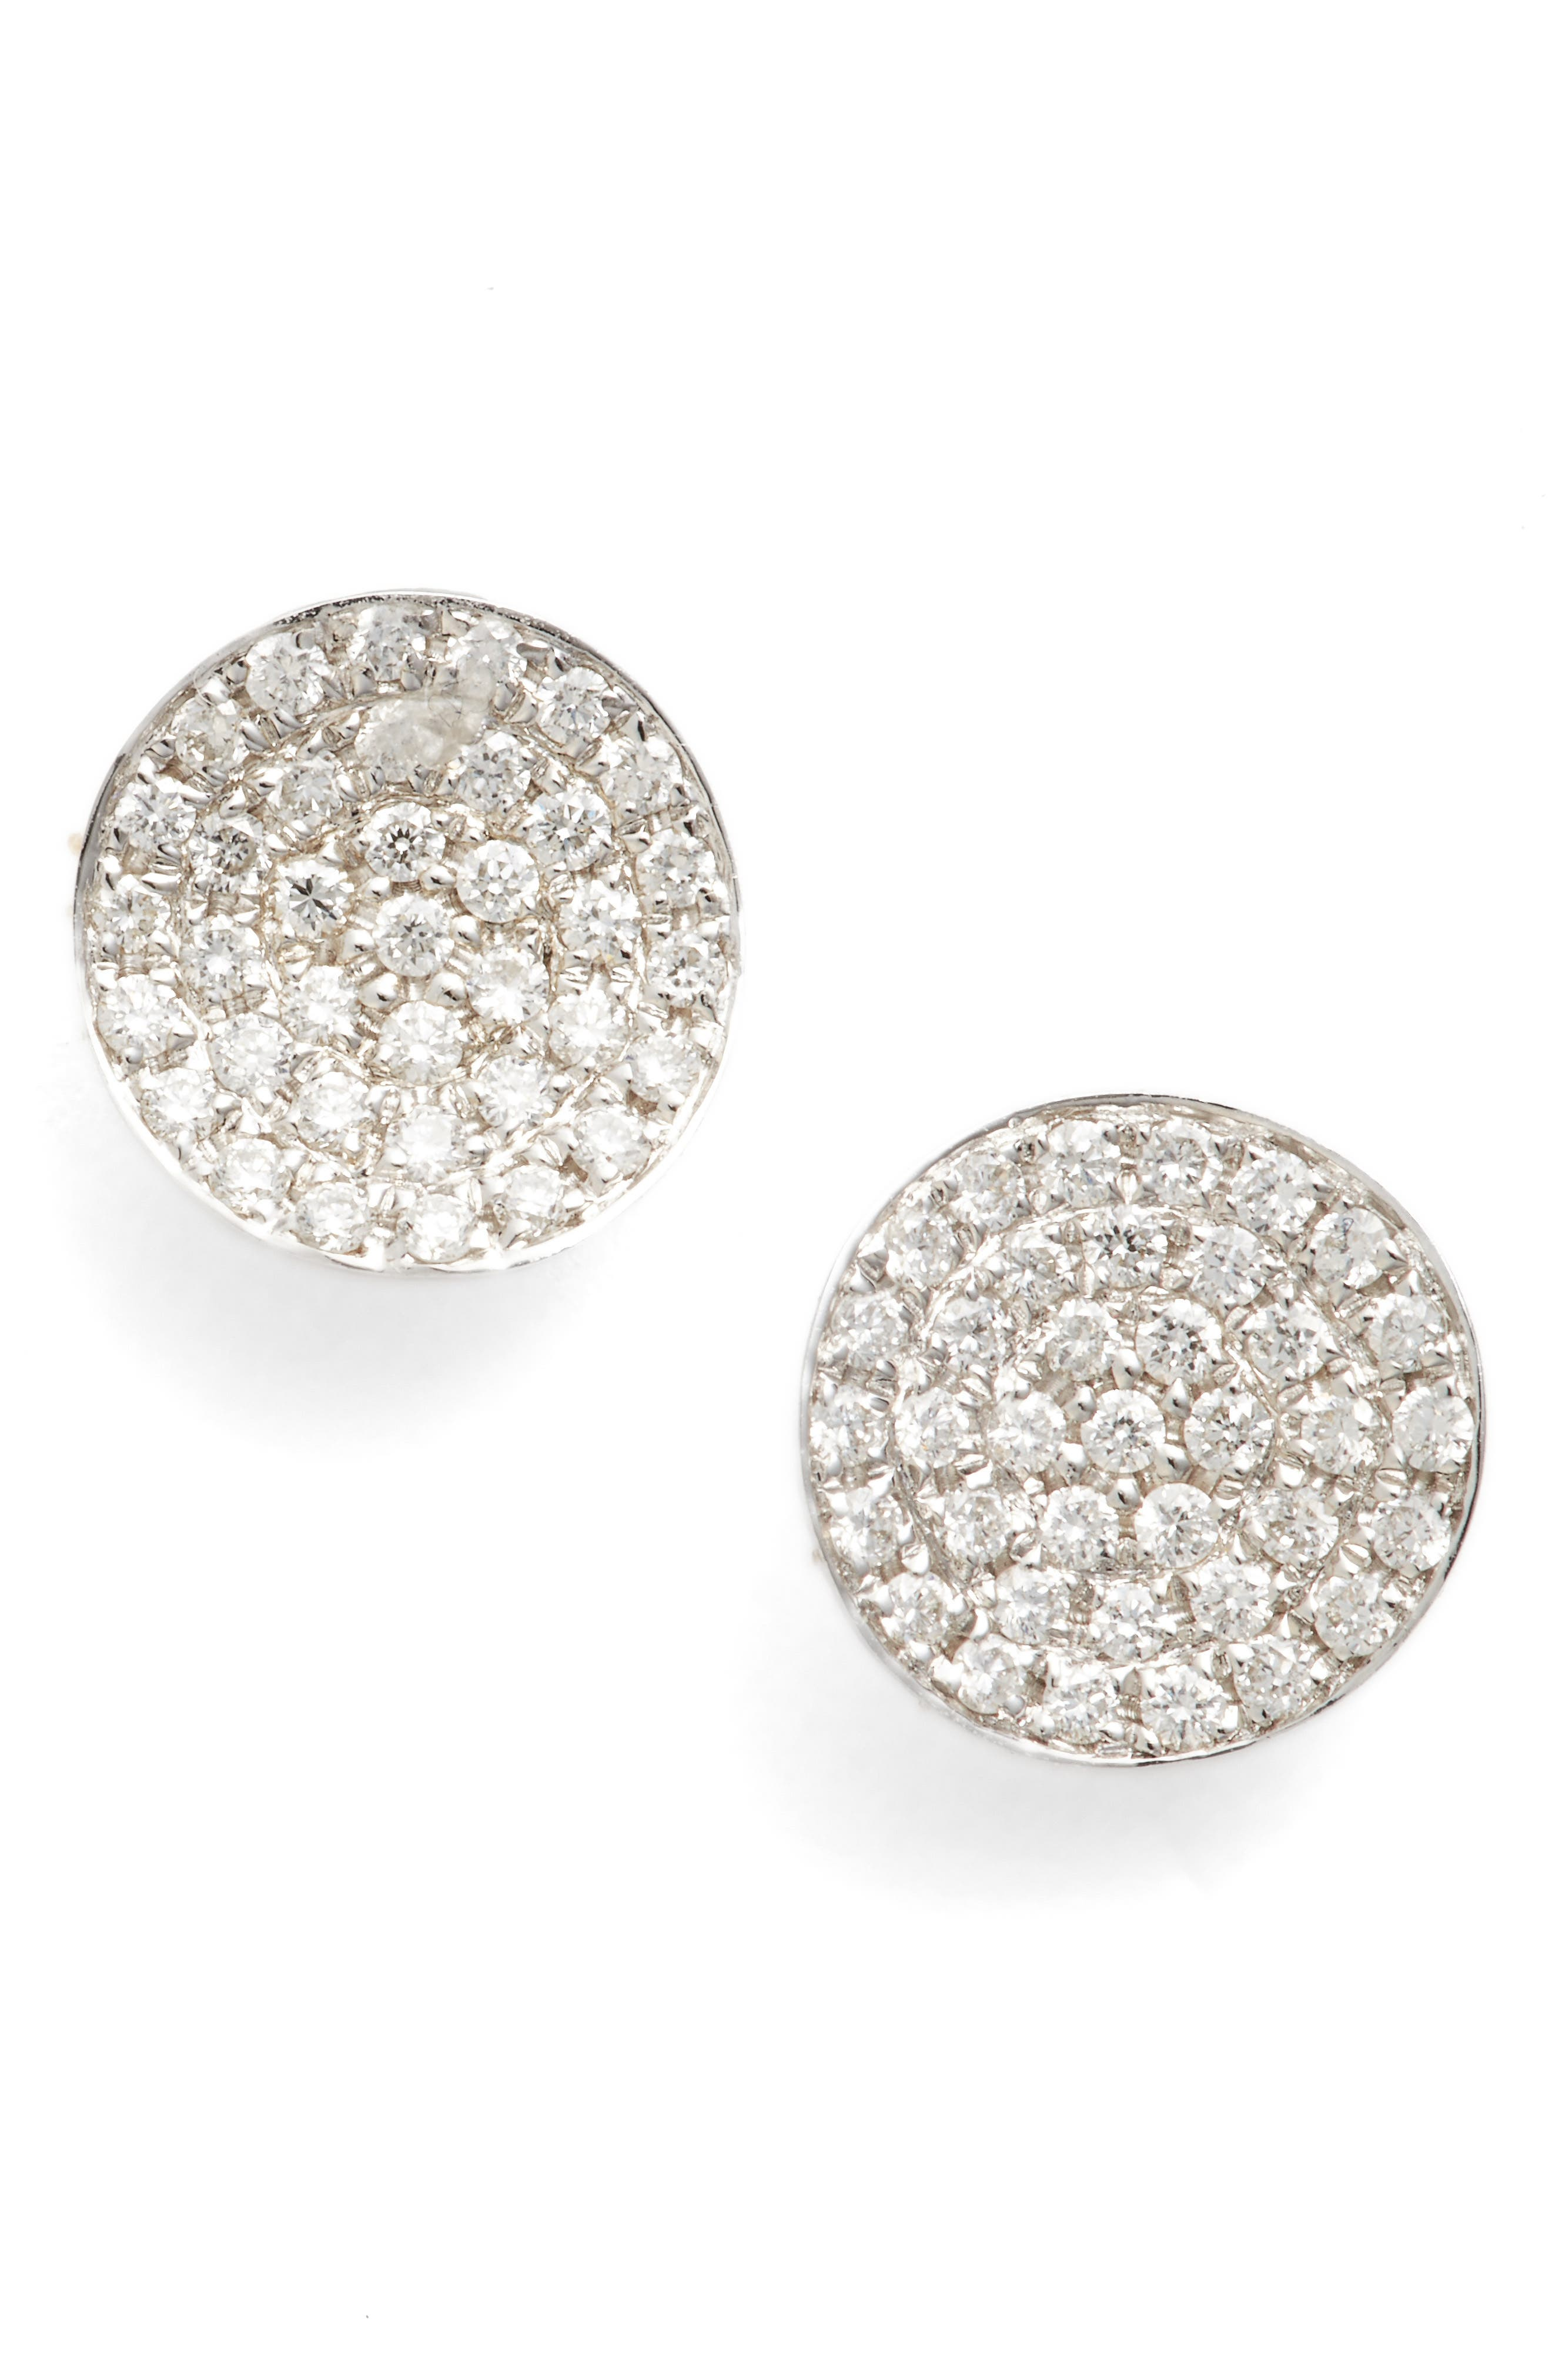 Alternate Image 1 Selected - Bony Levy Aurelia Diamond Concave Stud Earrings (Nordstrom Exclusive)